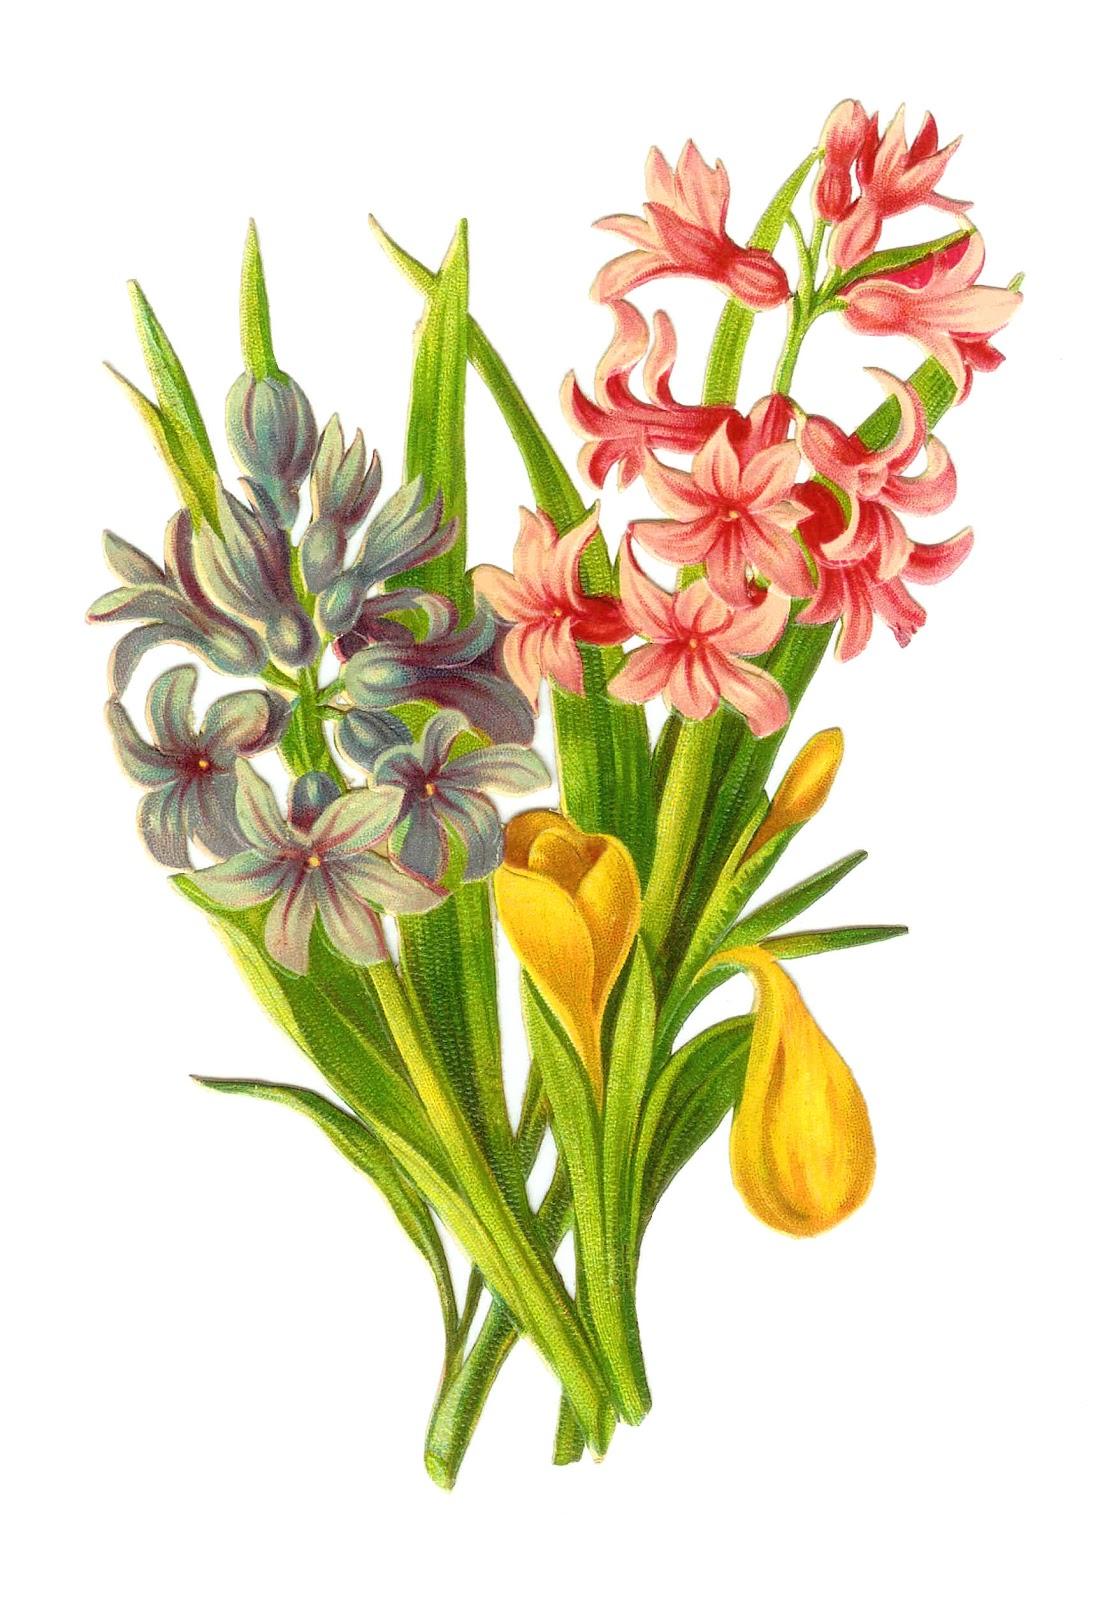 Antique Flower Clip Art Vintage Victorian Die Cut of Tulips and Hyac